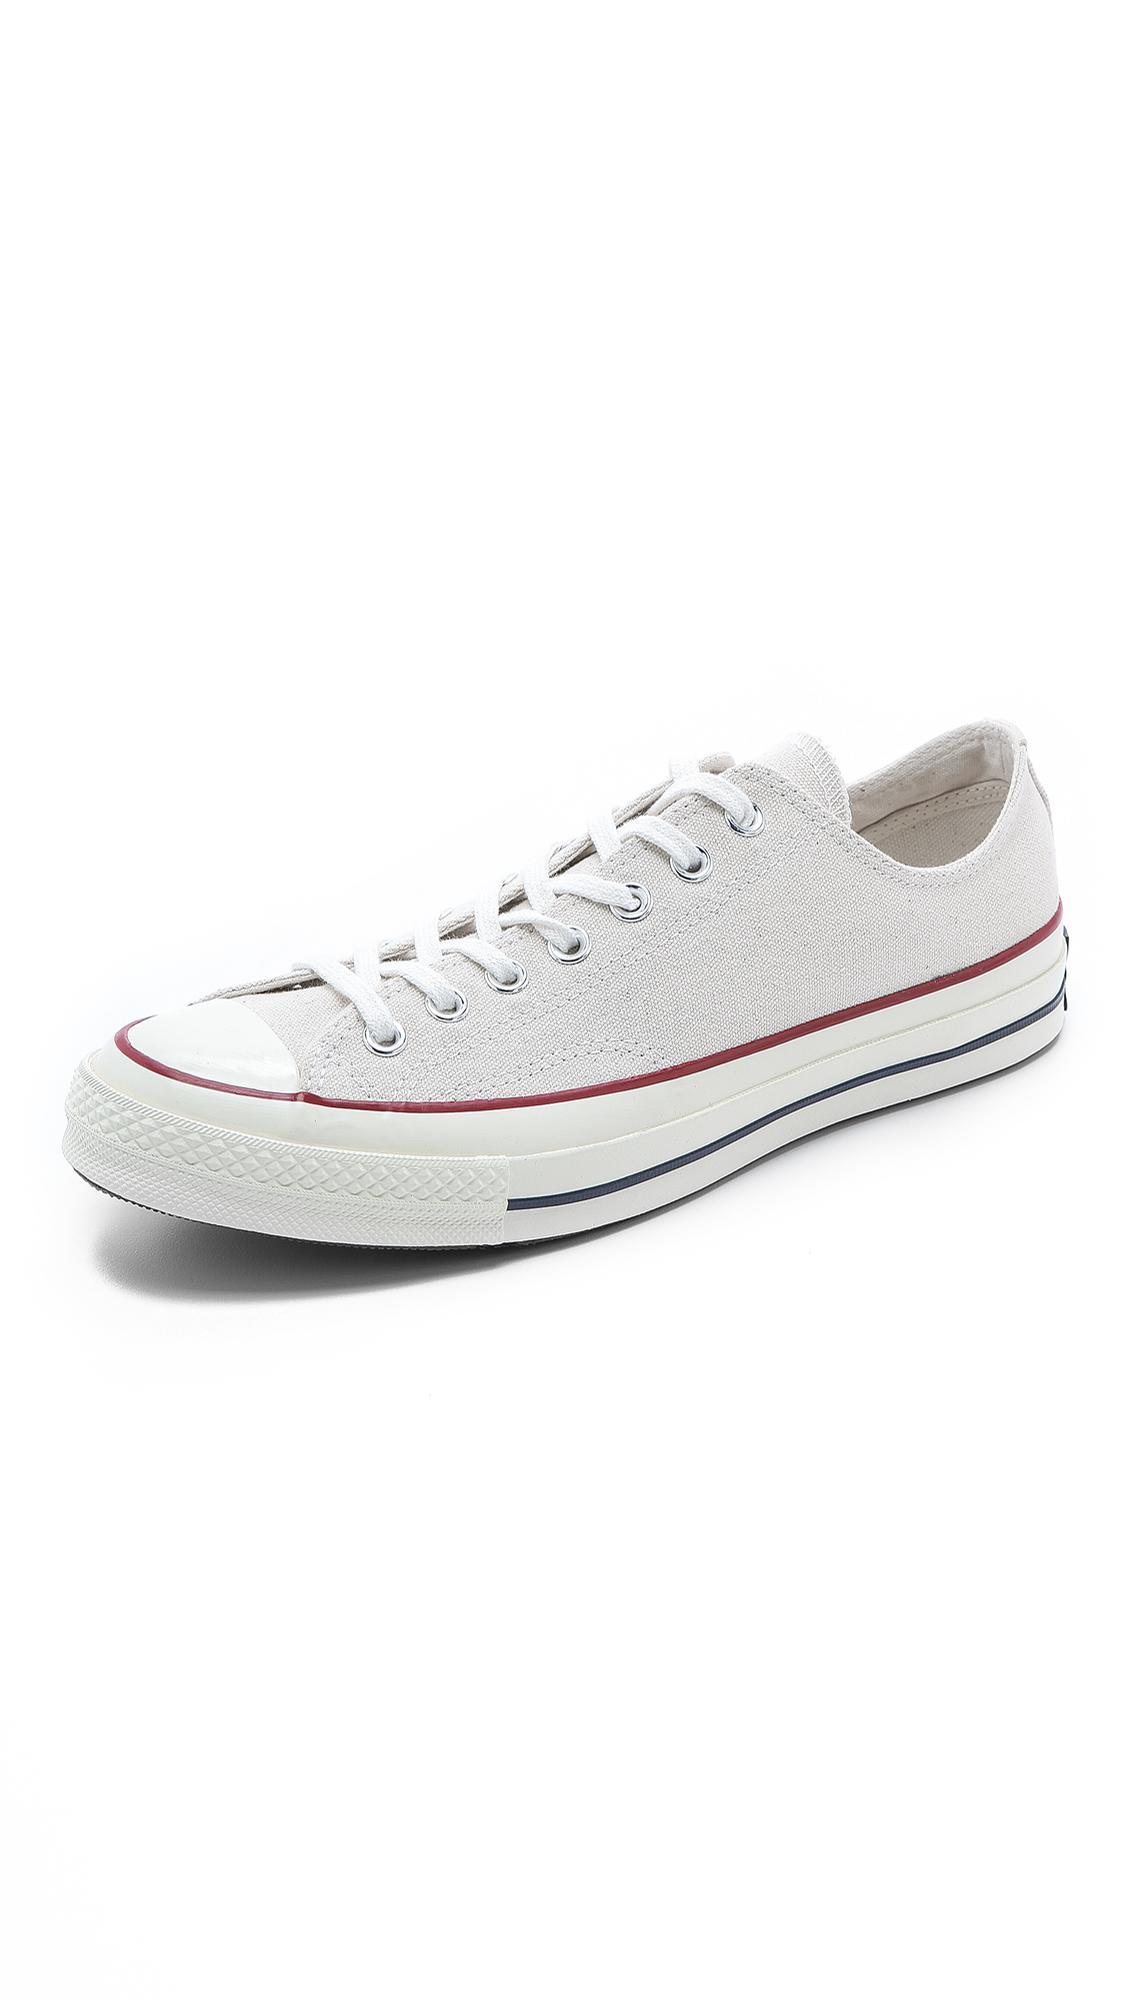 b53efd07c7e91a Converse Chuck Taylor All Star. CONVERSE. Chuck Taylor All Star  70S  Sneakers in Parchment